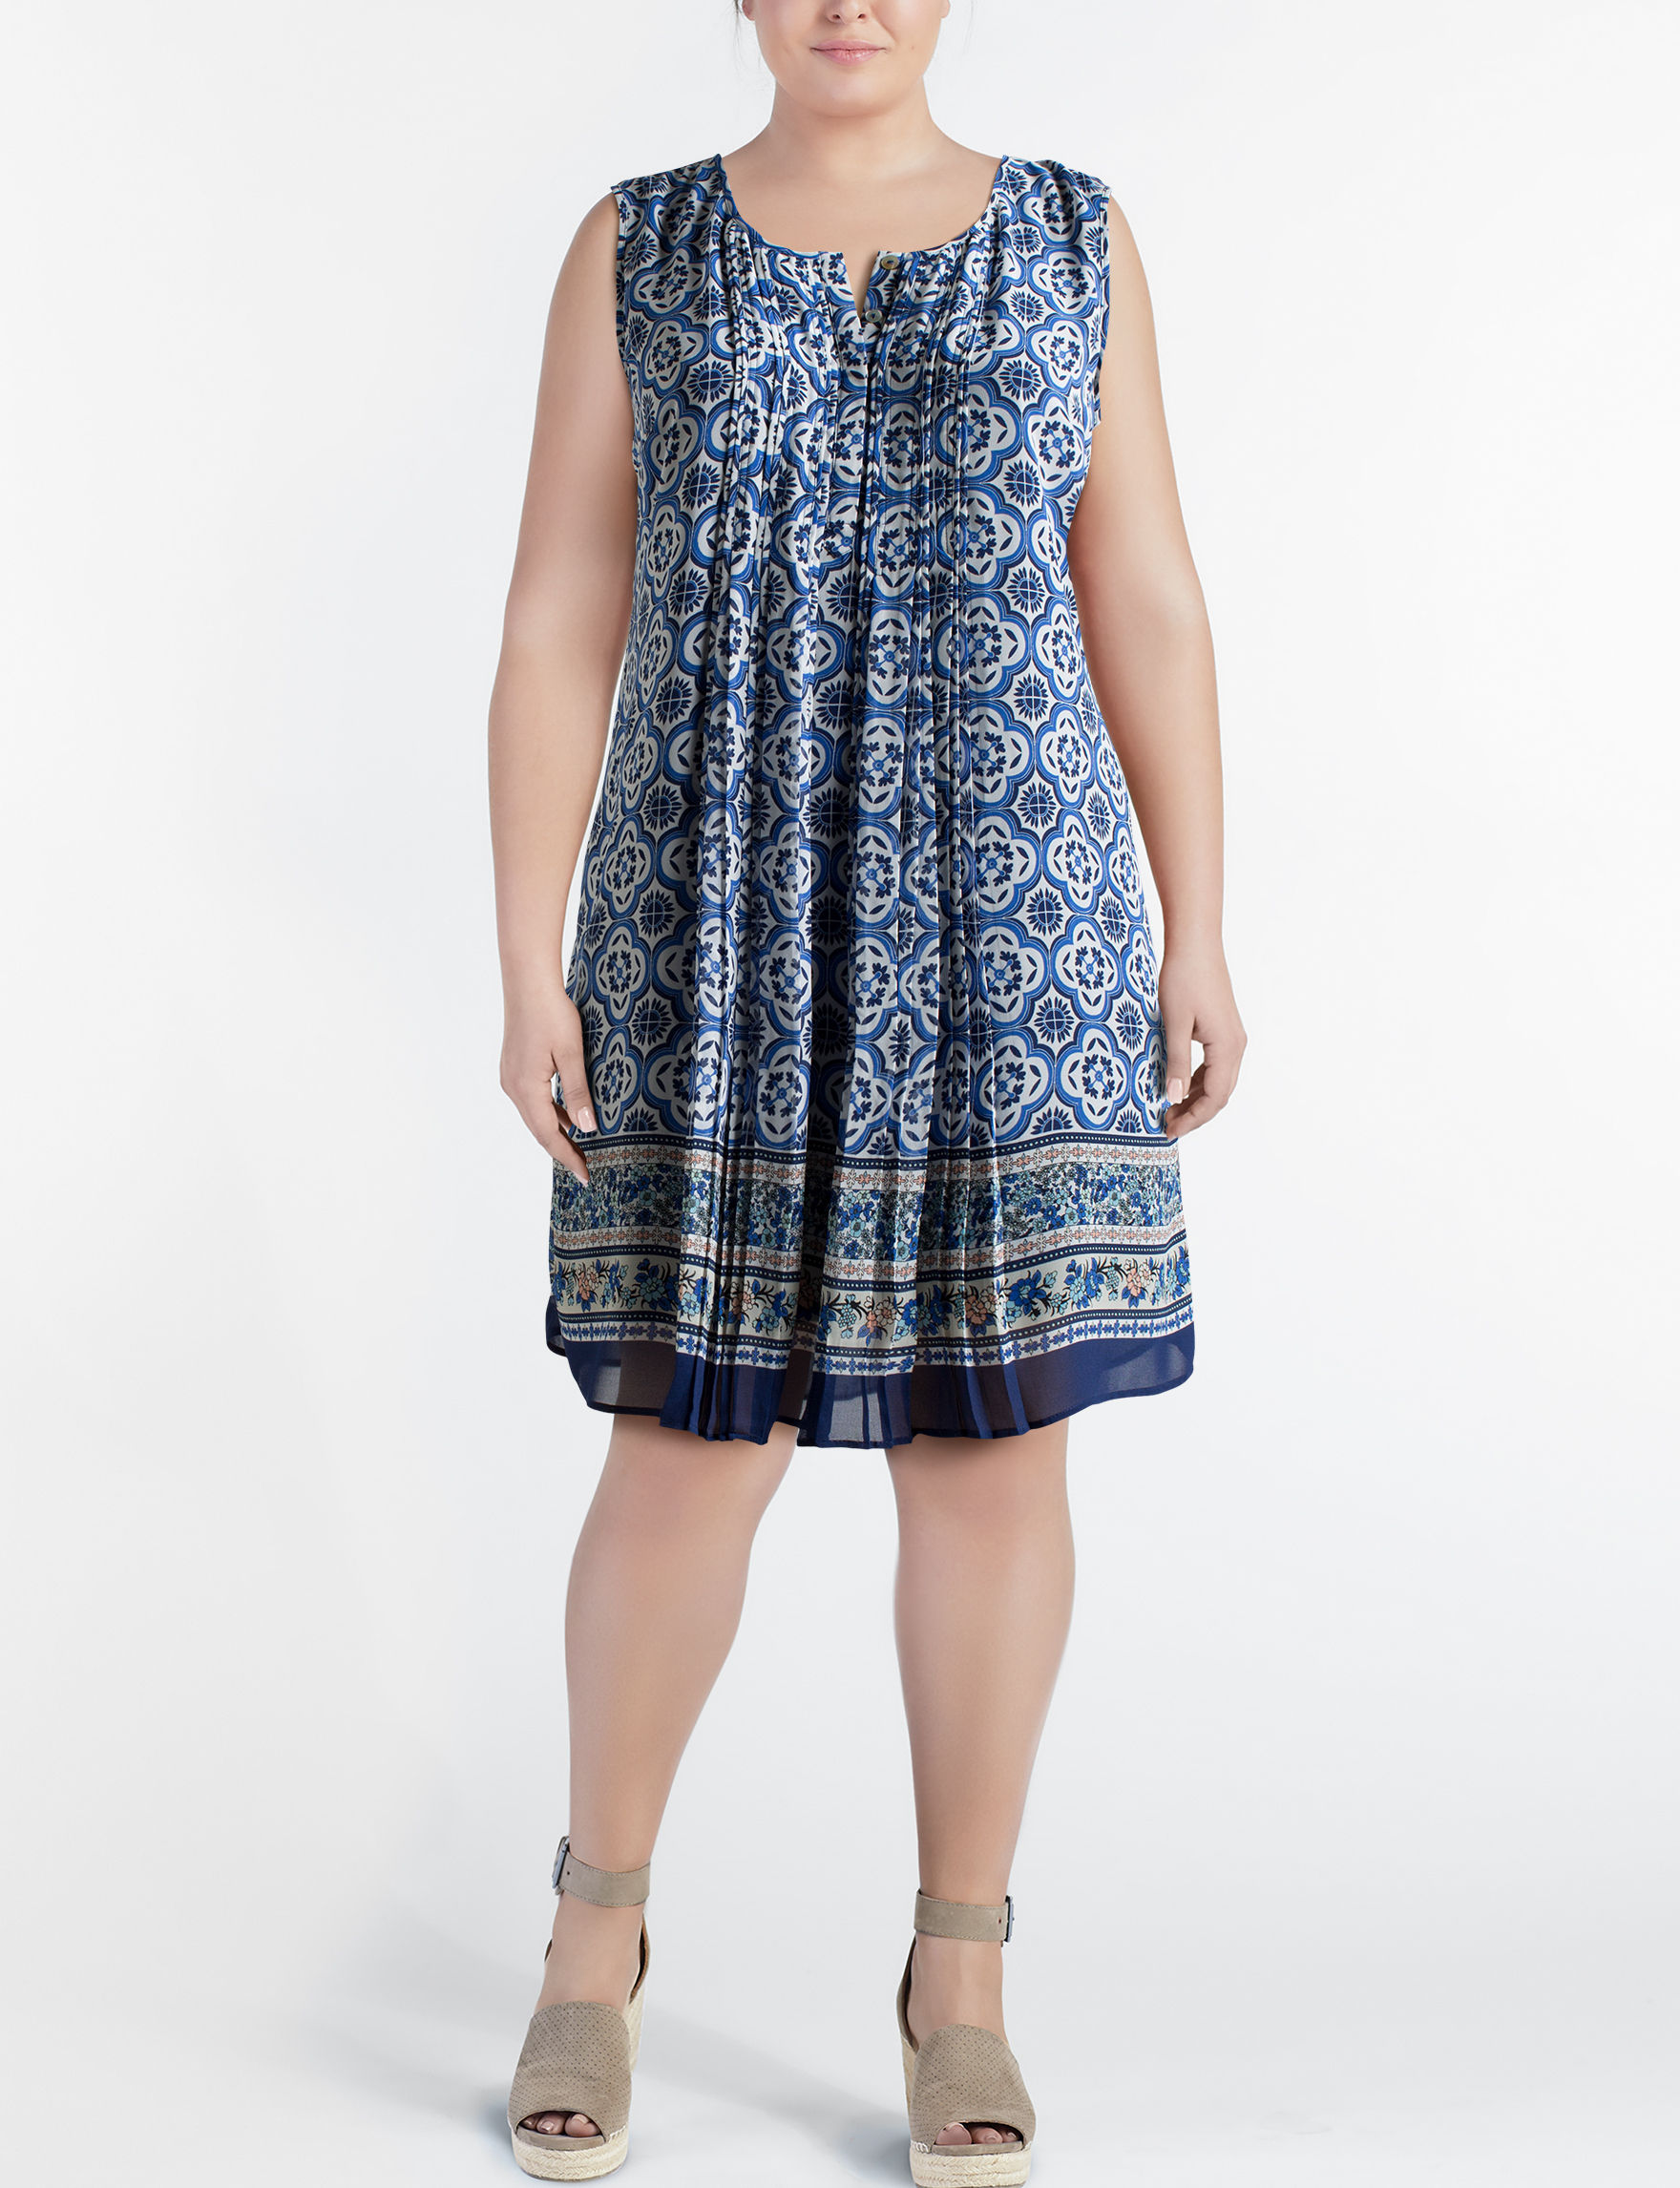 Signature Studio Blue Multi Everyday & Casual Shift Dresses